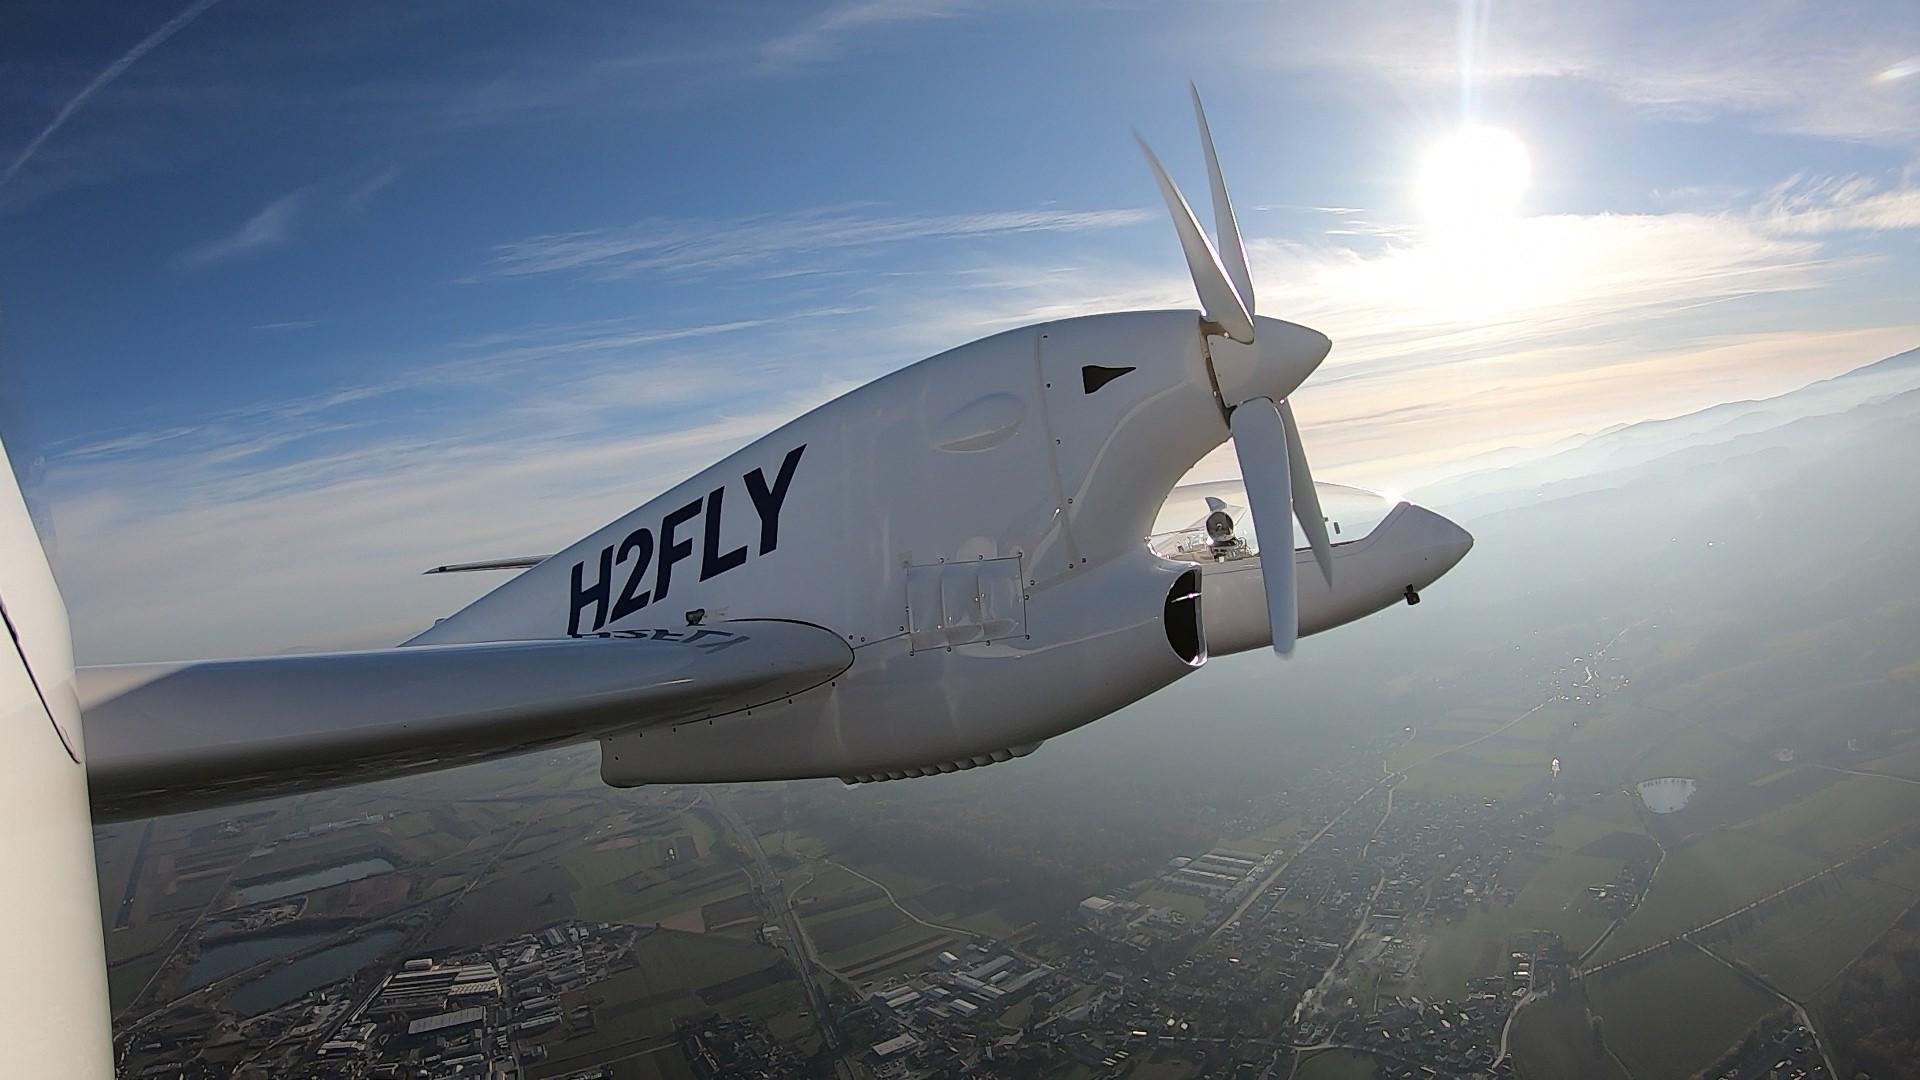 Hydrogen-electric passenger plane HY4 flies emission free over 240 km (150 miles)